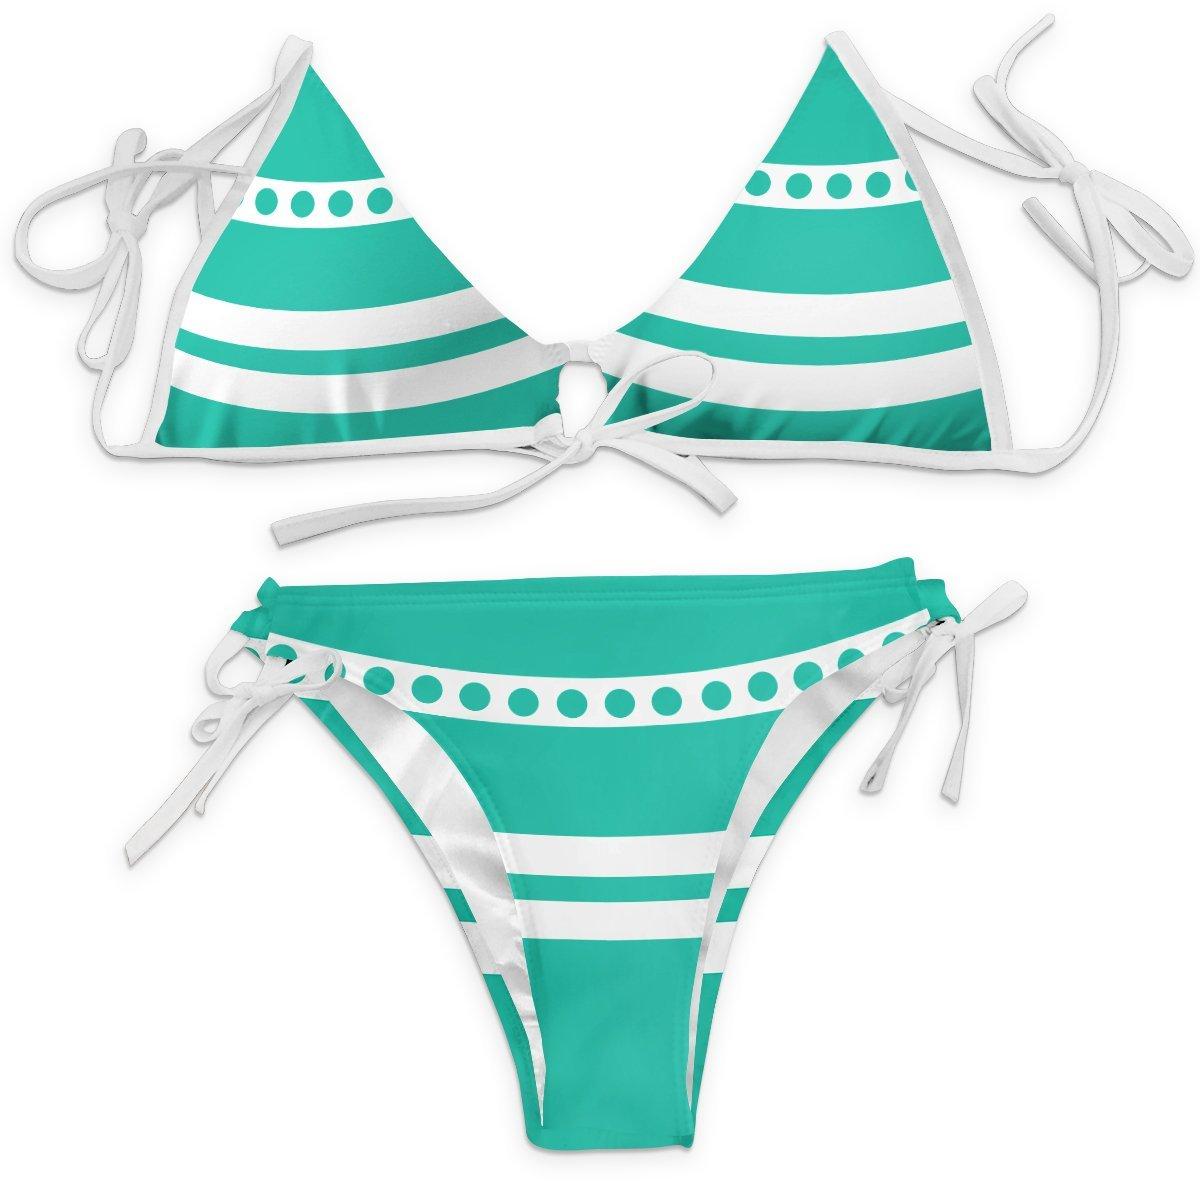 Nami Summer Bikini Swimsuit FDM3107 XXS Official Anime Swimsuit Merch